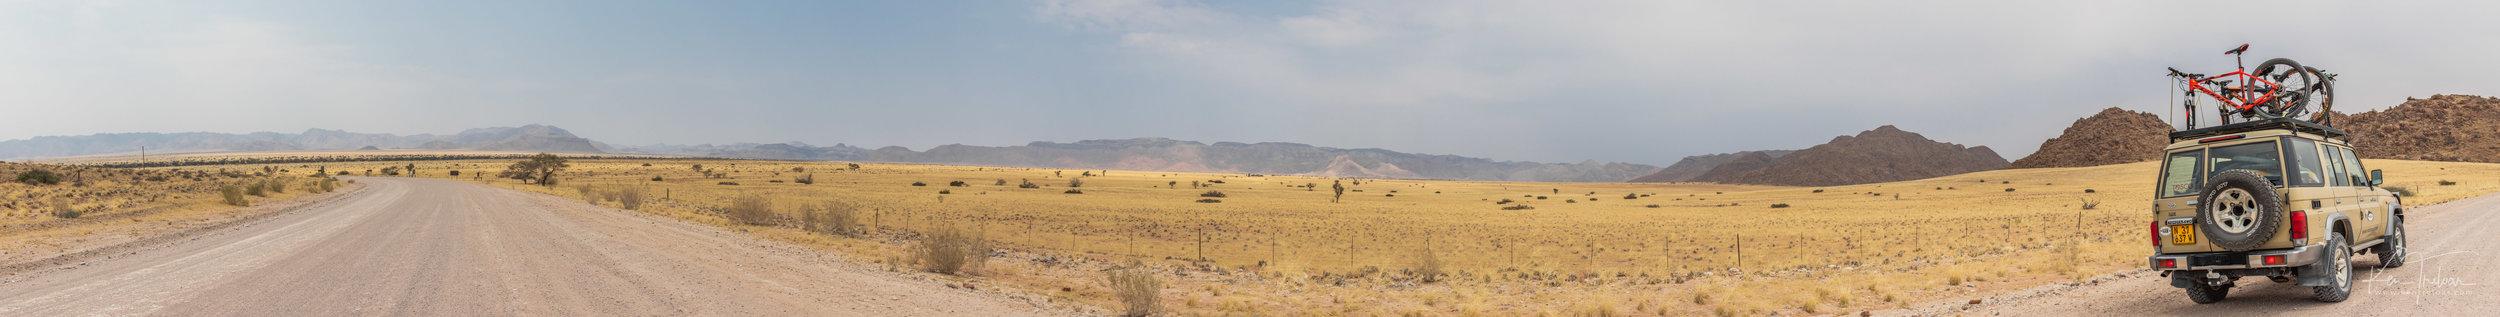 Namibian Grassland Pass 1 (shot hand-held) Camera: Canon 200D Lens: 24-70mm f/4 L 1/640sec ; f/8.0 26625 x 3380